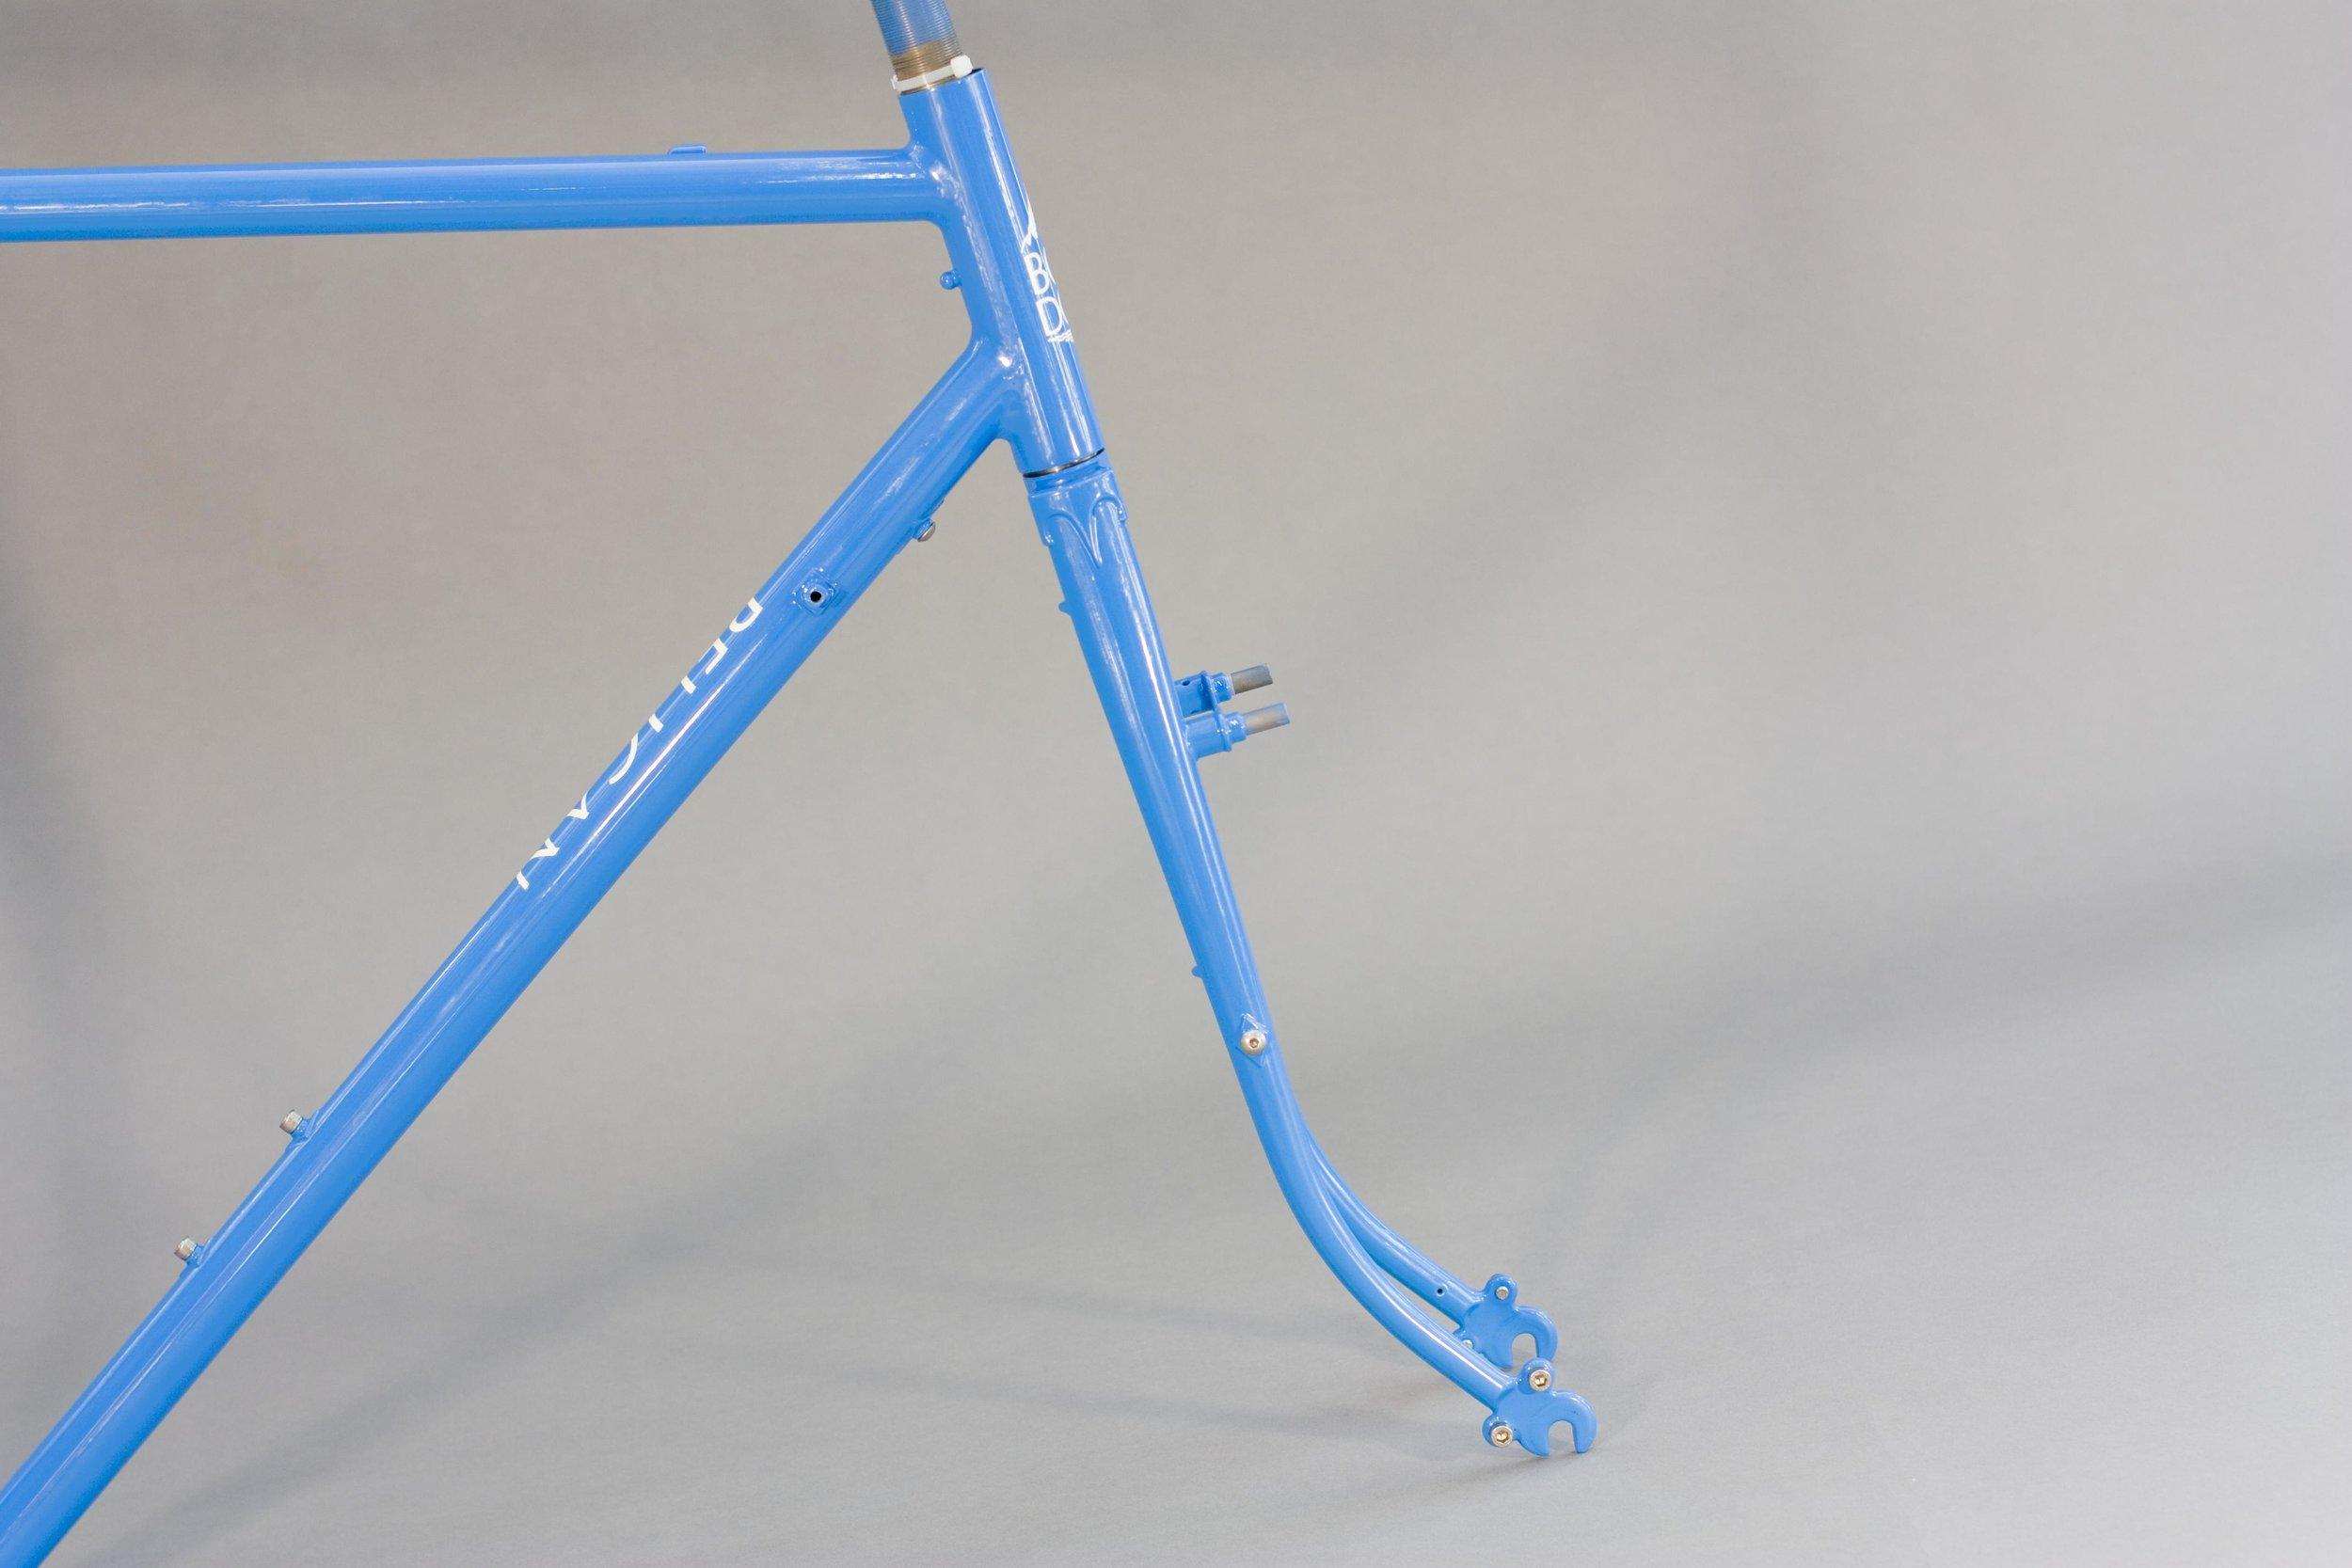 56cm-winter-bicycles-built-pelican_8269871159_o.jpg